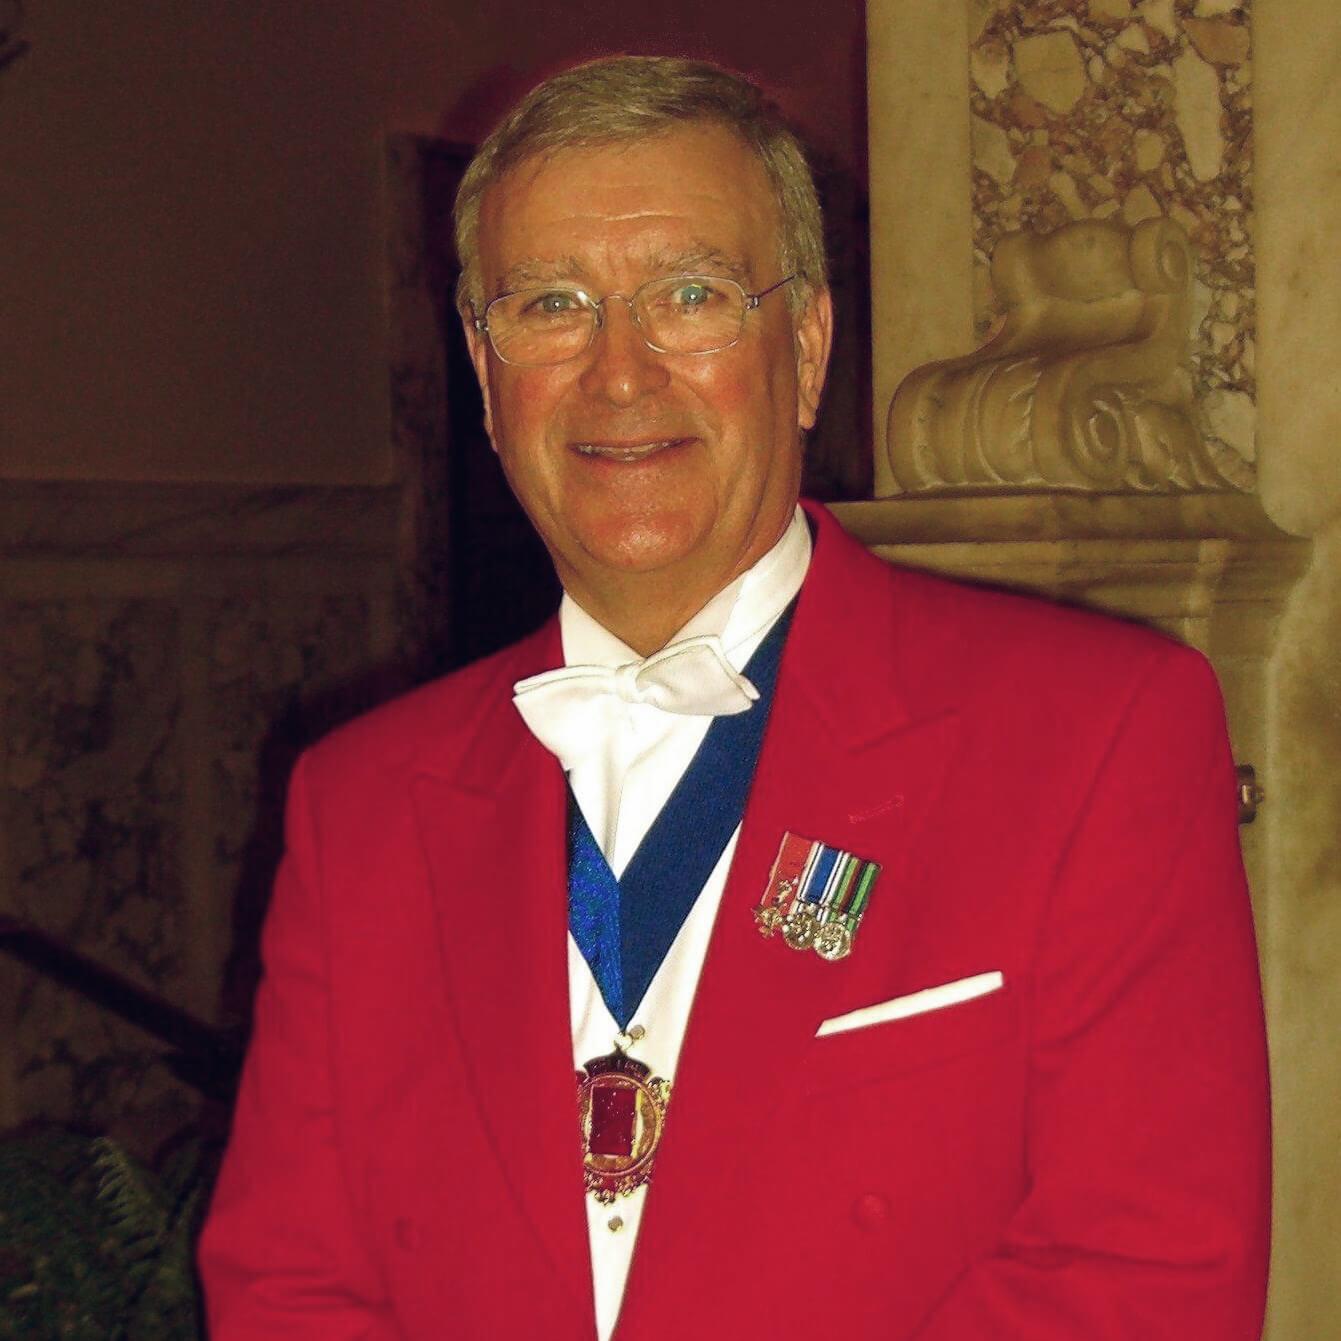 Professional Toastmaster and Master of Ceremonies Northern Ireland - Jack Adair